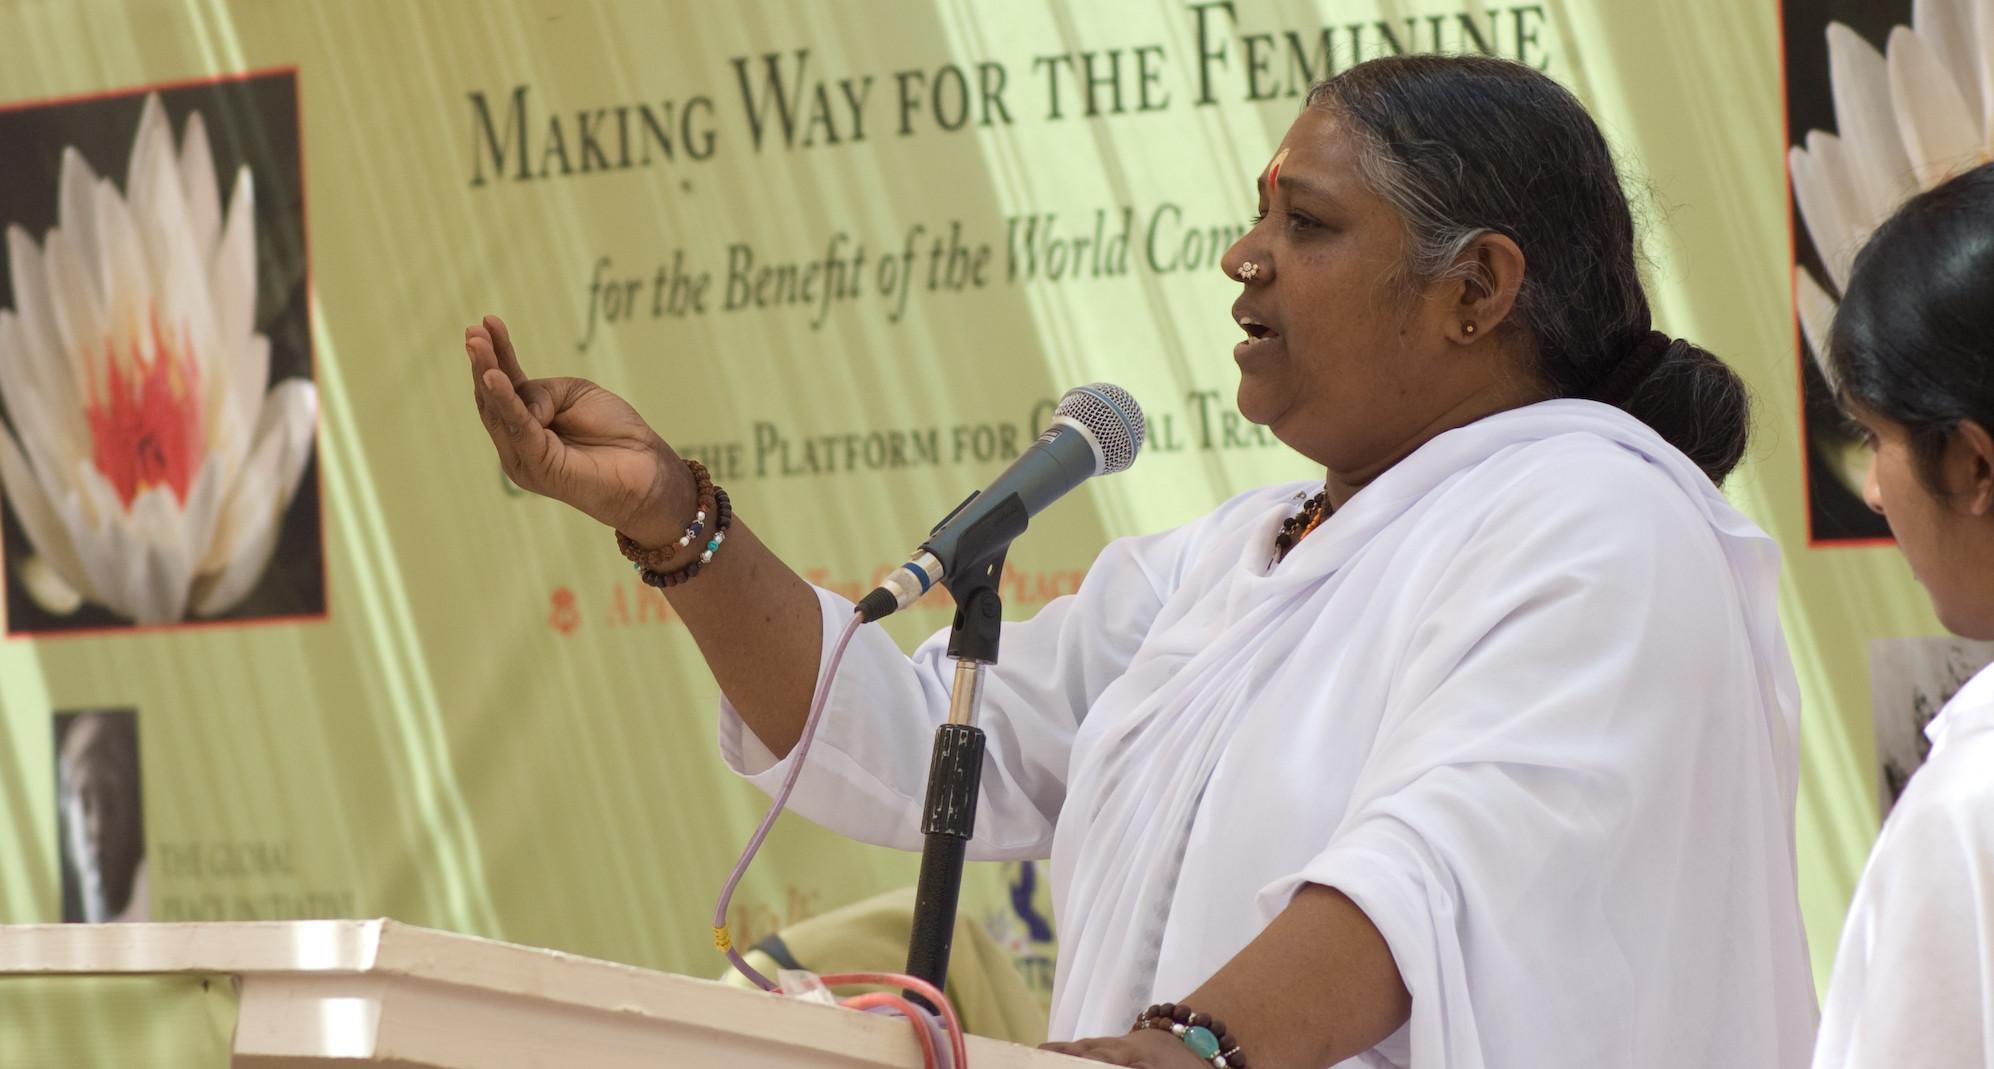 Woman Summit Ansprache